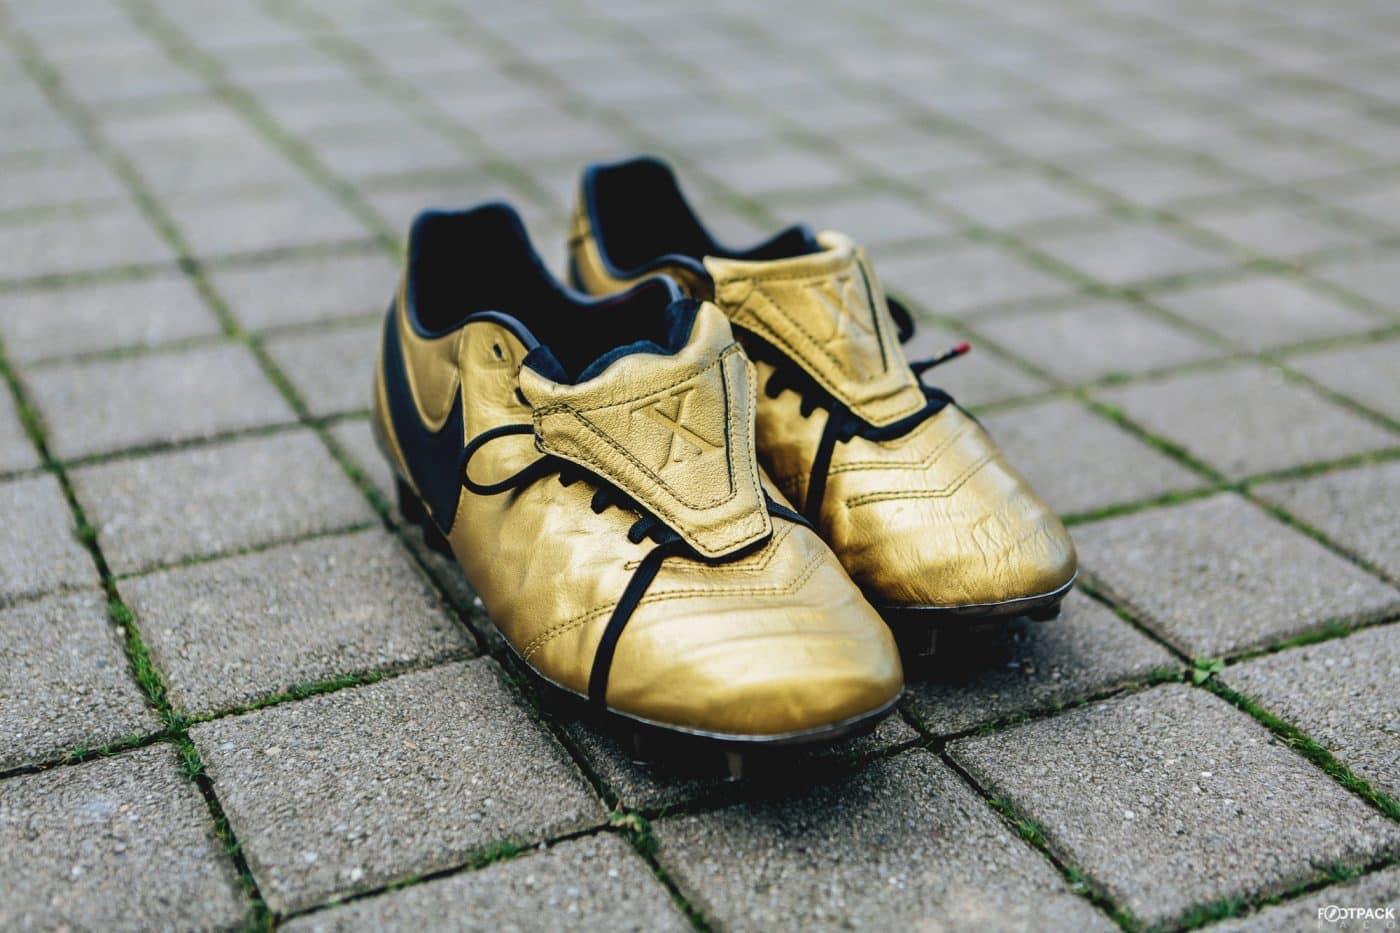 nike-tiempo-legend-6-francesco-totti-footpack-7